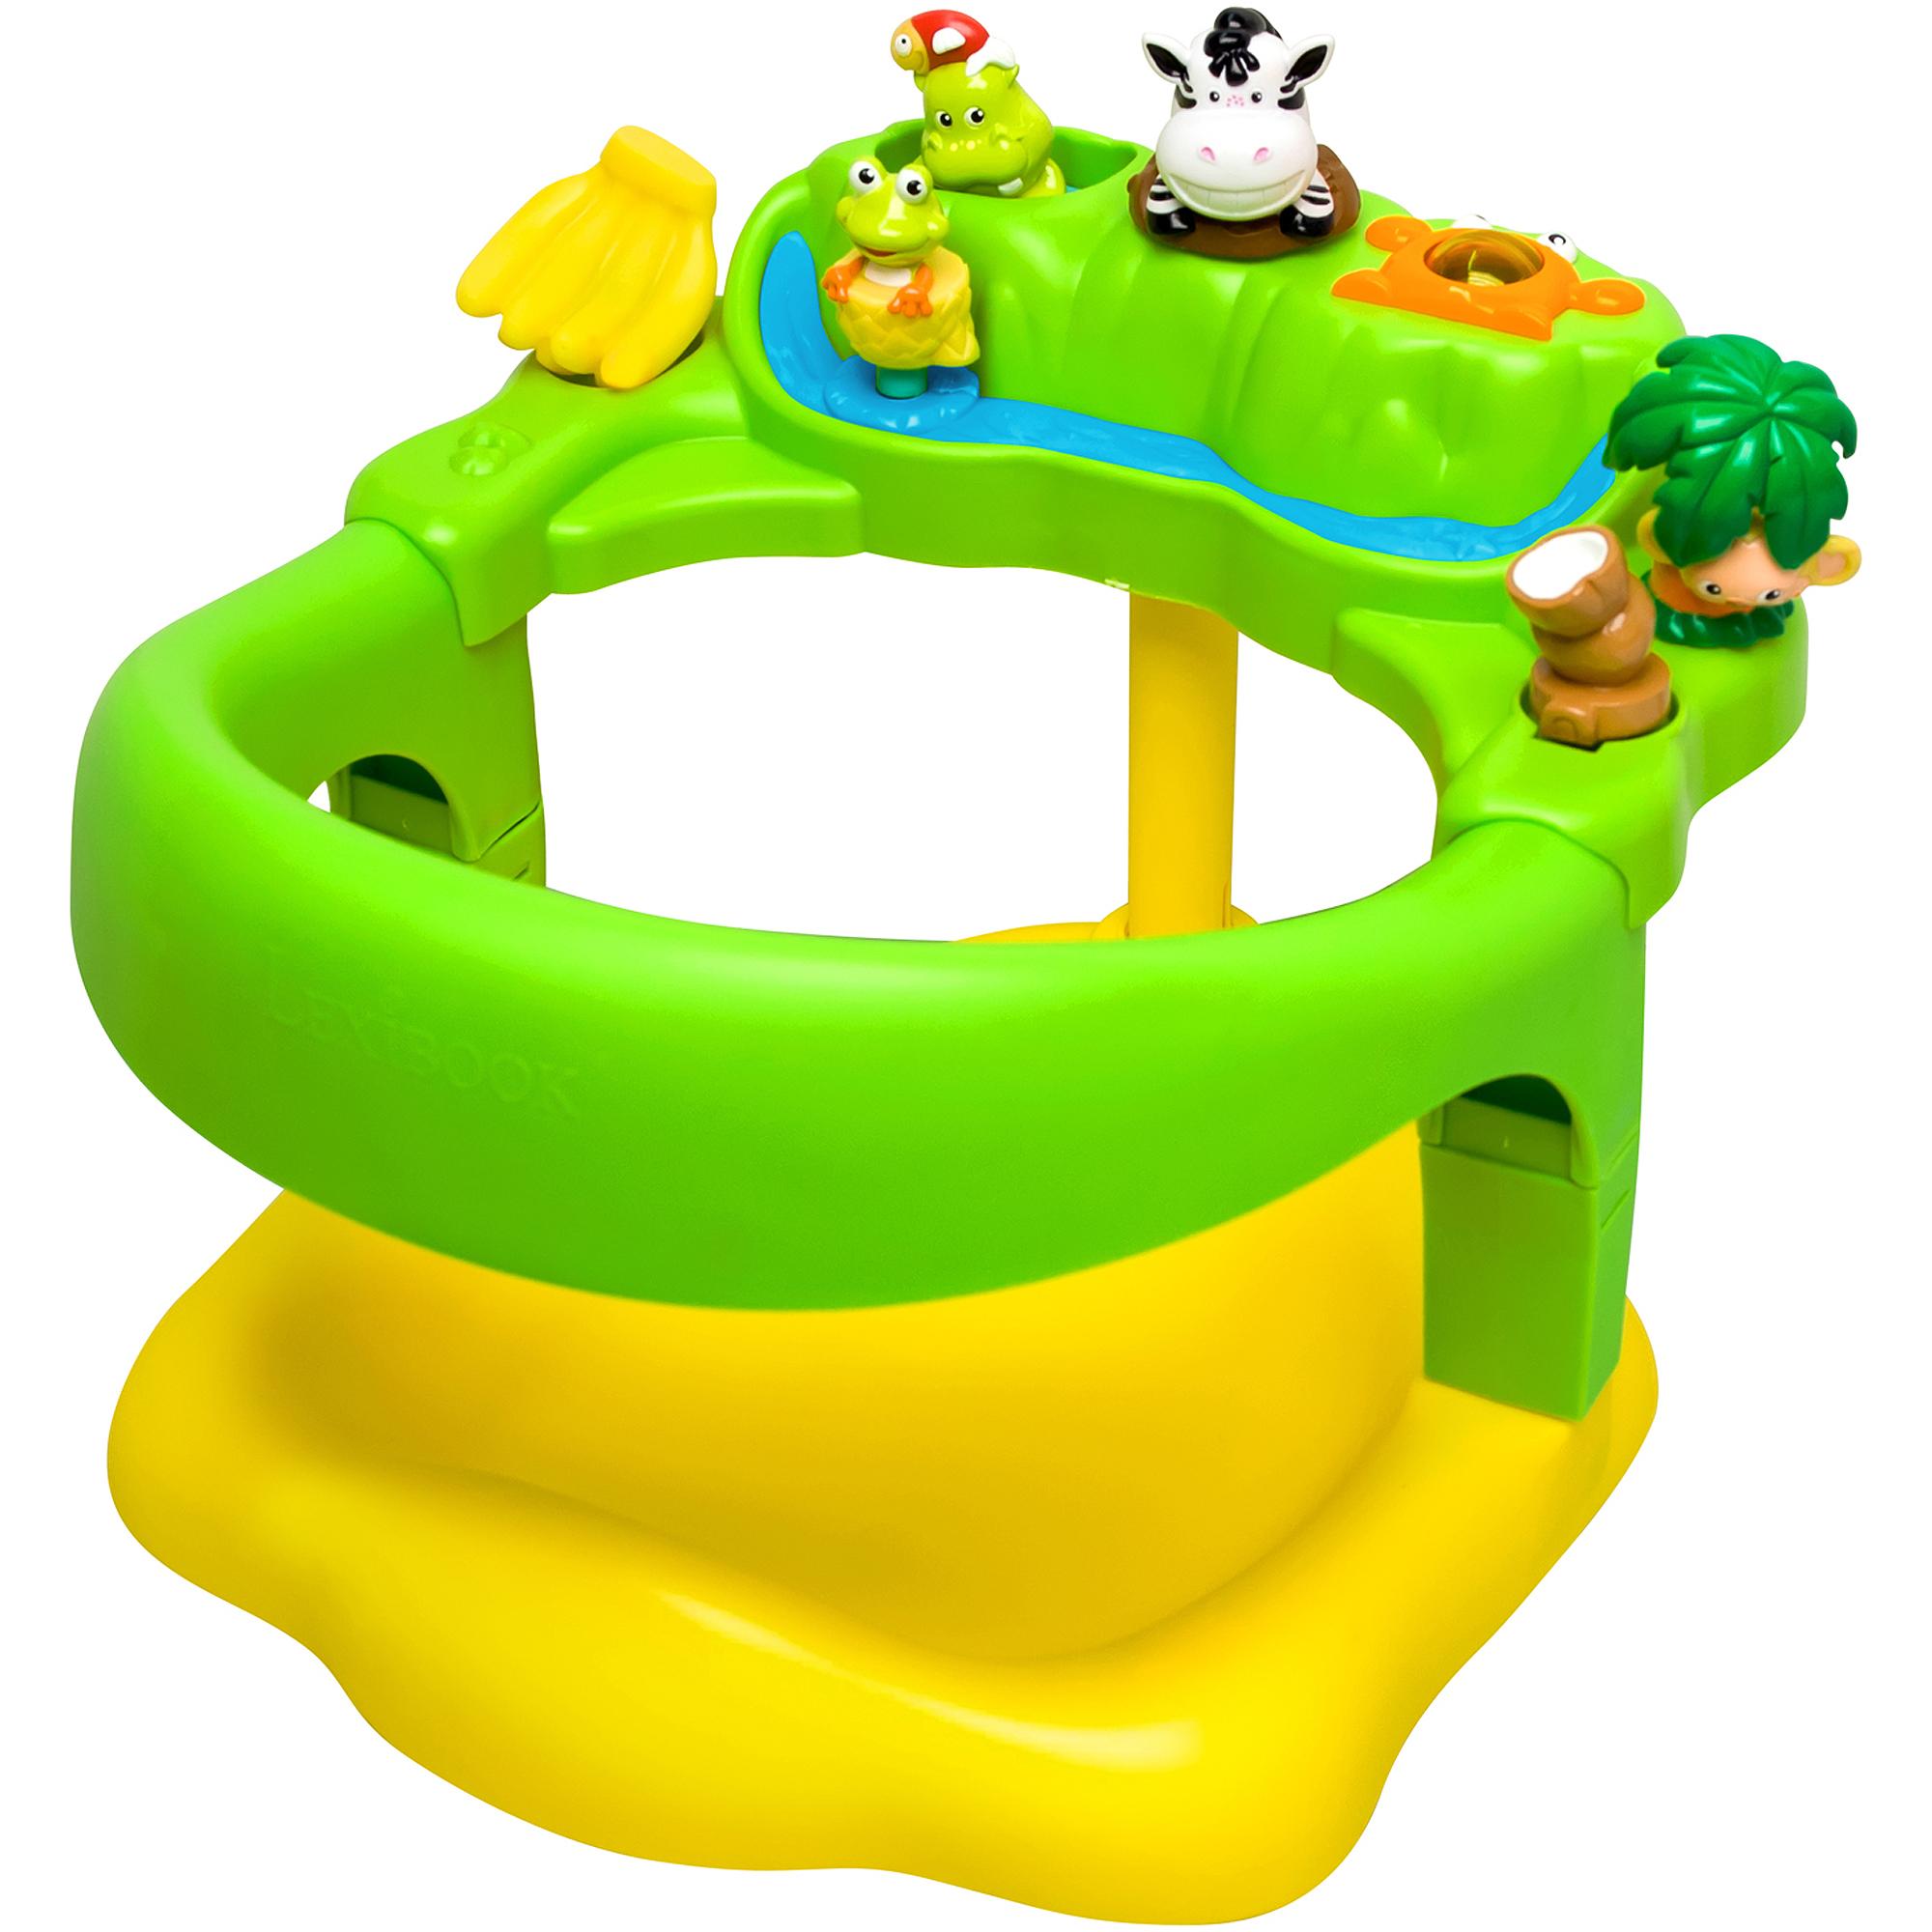 Lexibook Tropical Bath Seat - Walmart.com